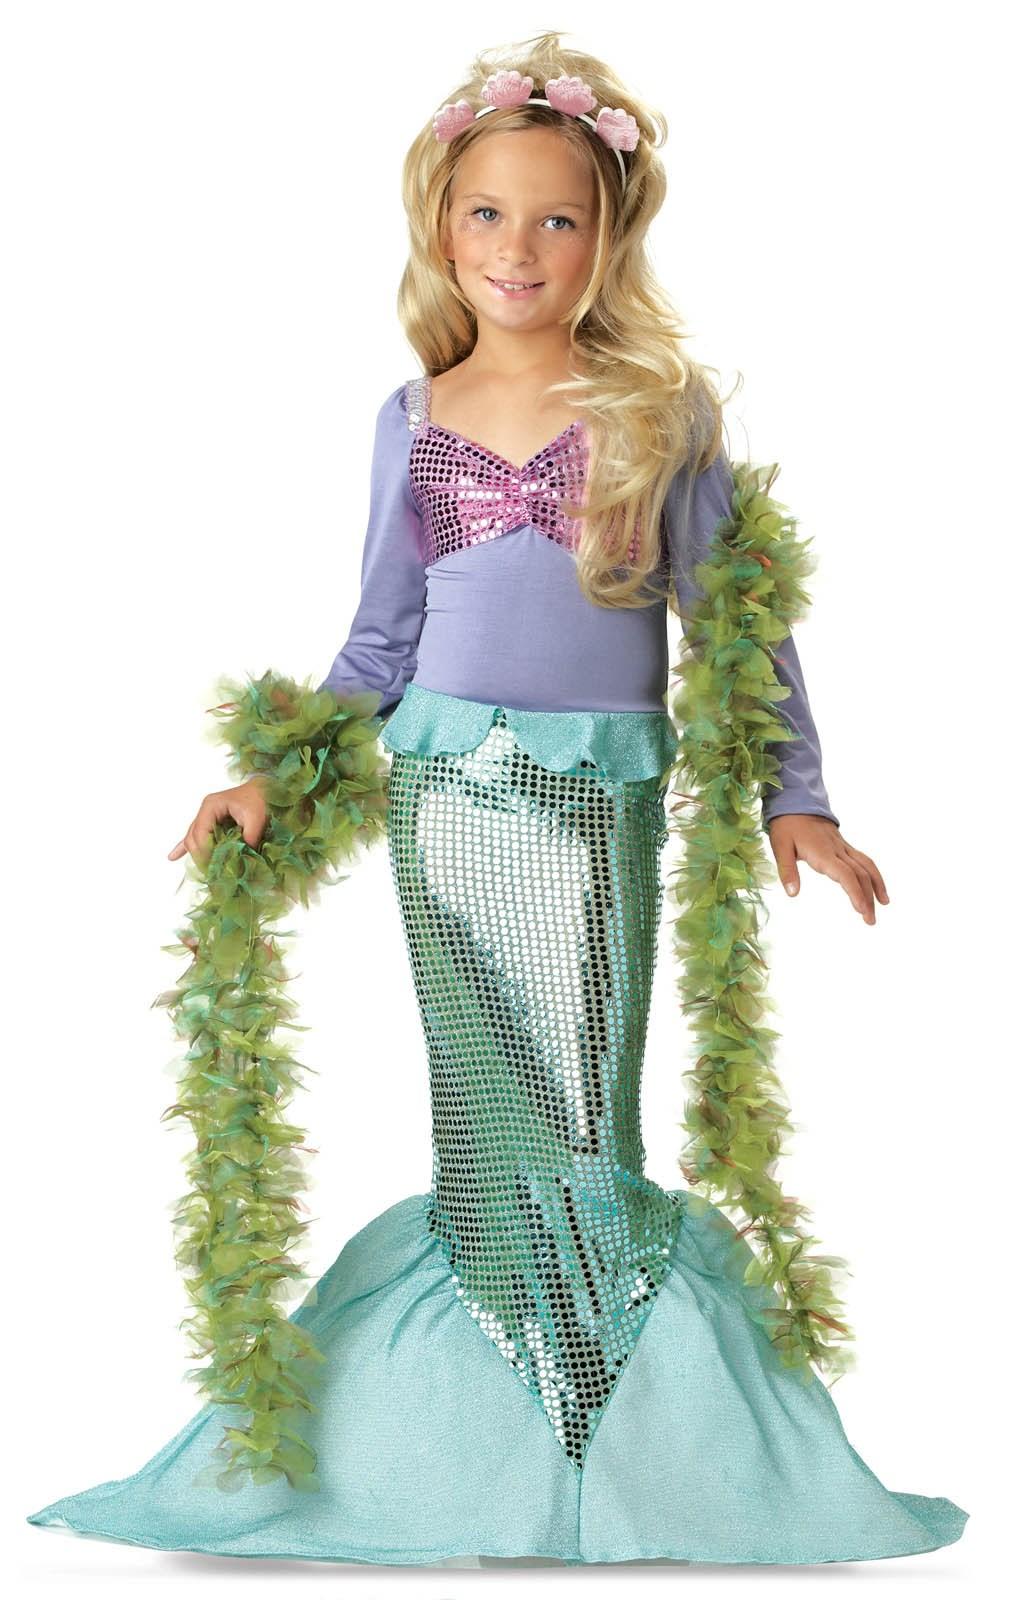 Image of Lil' Mermaid Toddler / Child Costume Child Medium (8-10)